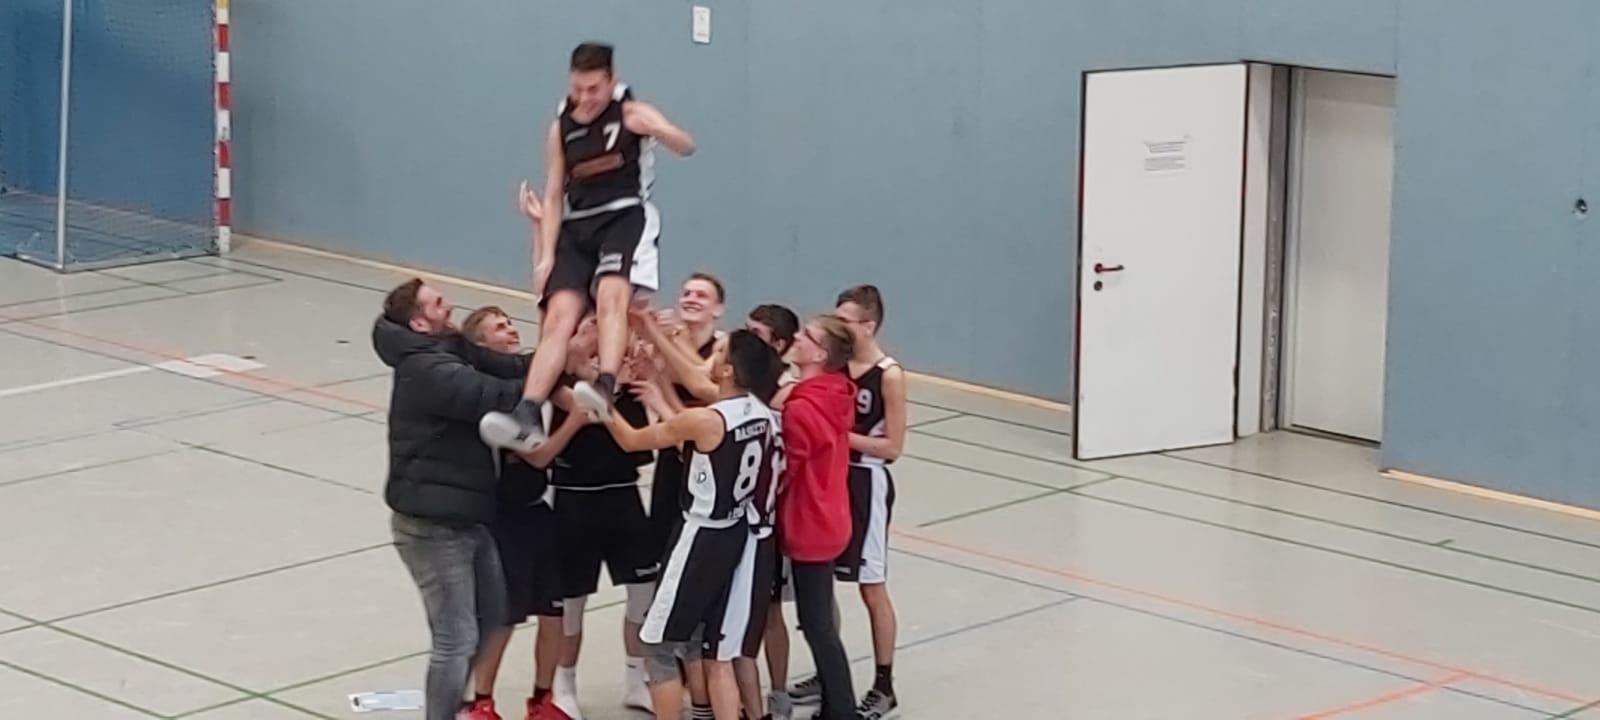 U16-Oberliga: Saisonsieg mit Makel